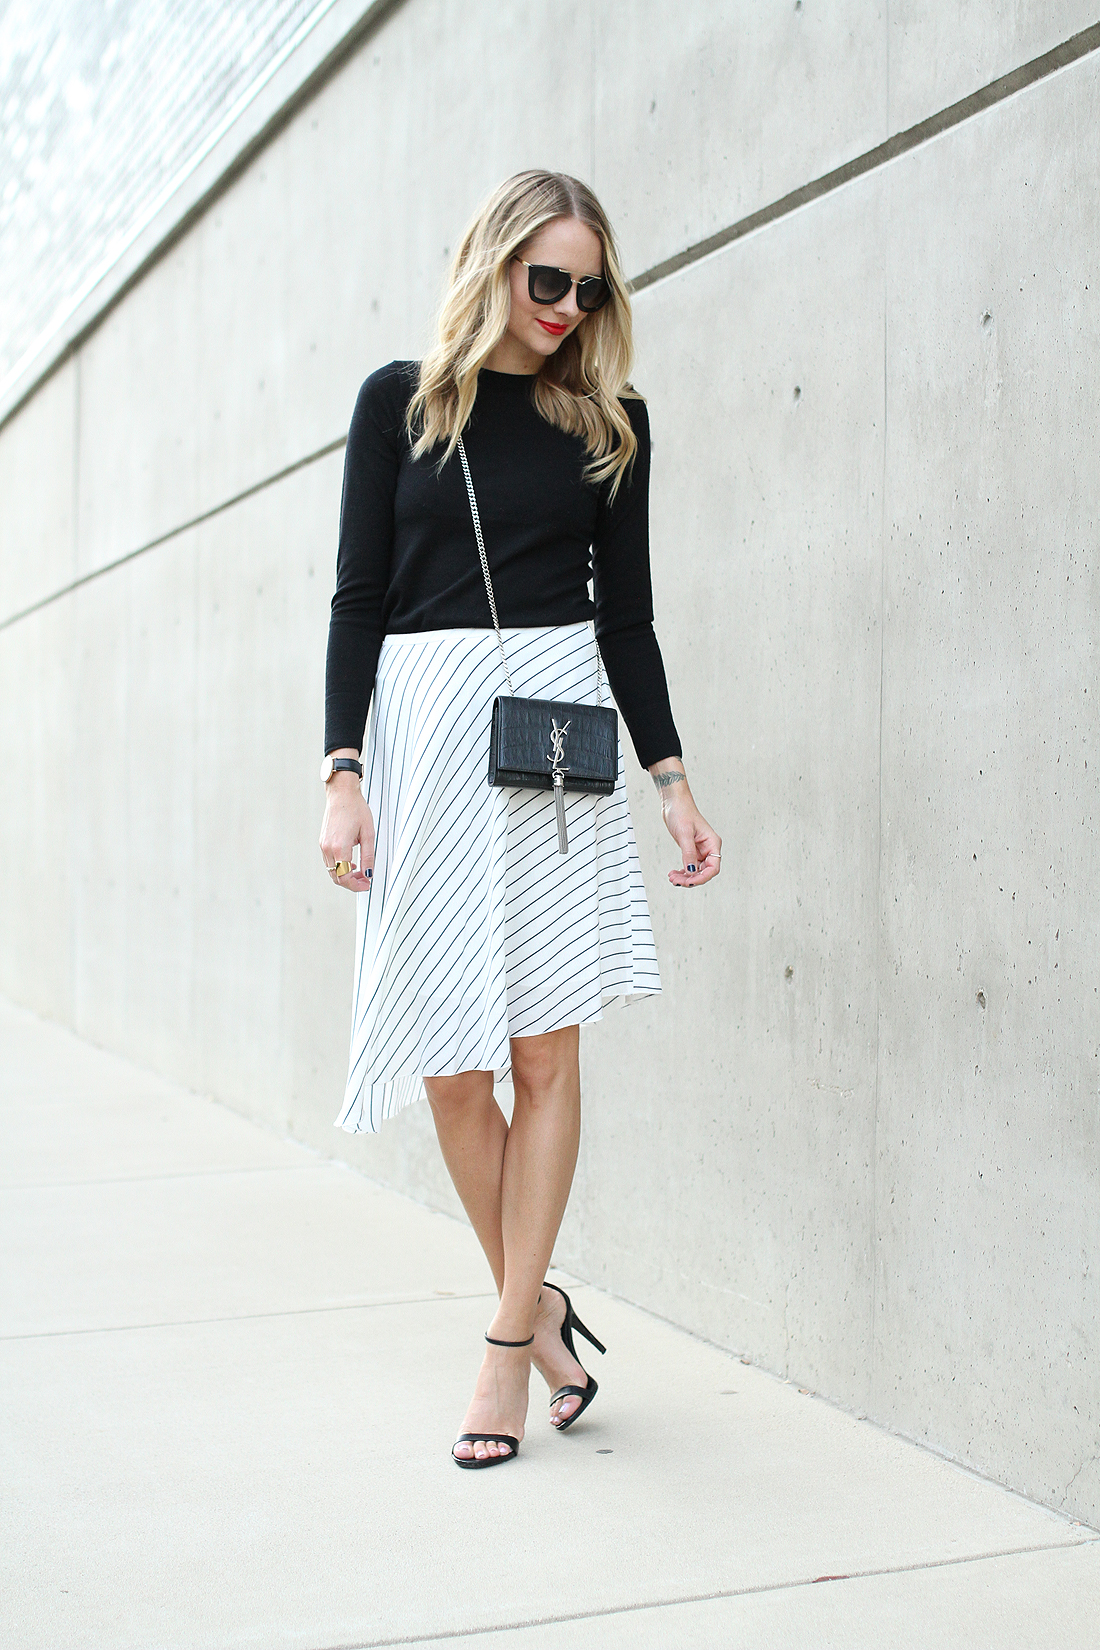 fashion-jackson-club-monaco-white-asymmetrical-skirt-black-sweater-prada-sunglasses-saint-laurent-crossbody